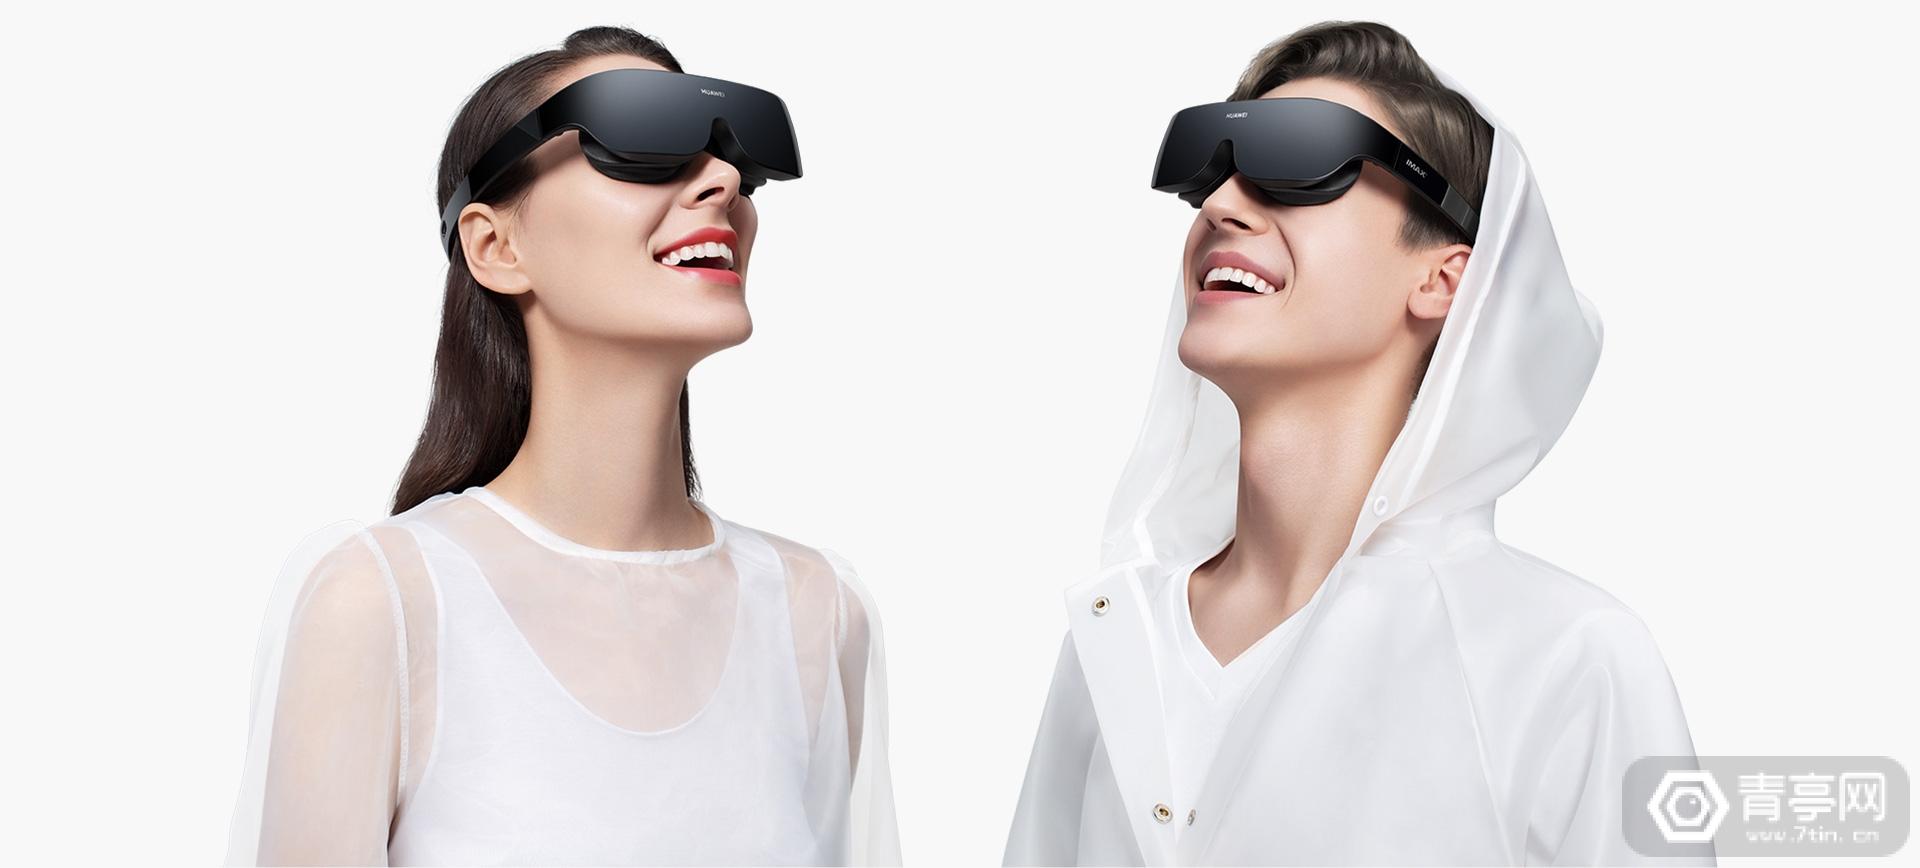 XR情报局:华为VR Glass要怎么玩,我们帮你试了试